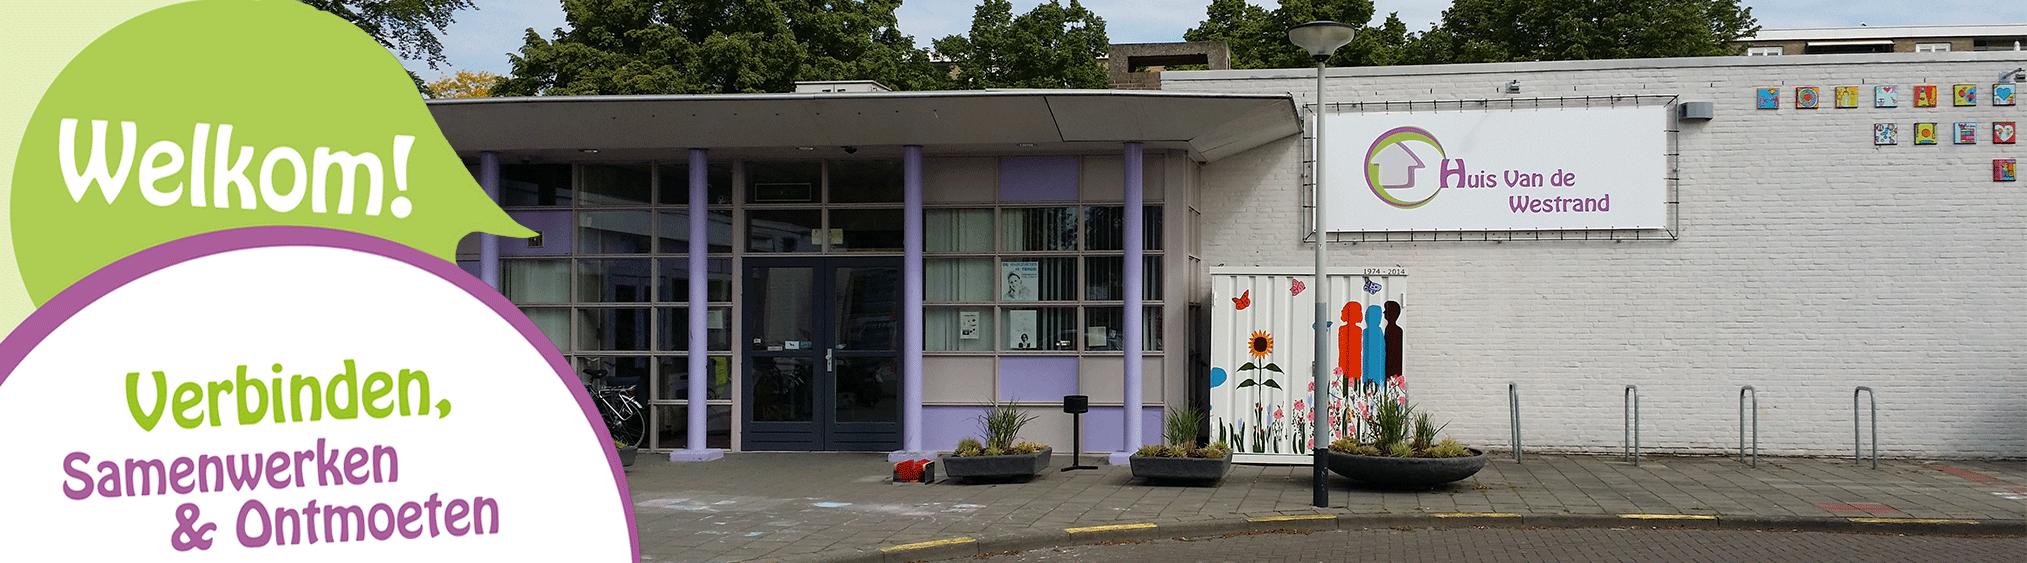 Slider-wijkbedrijf-westrand-web